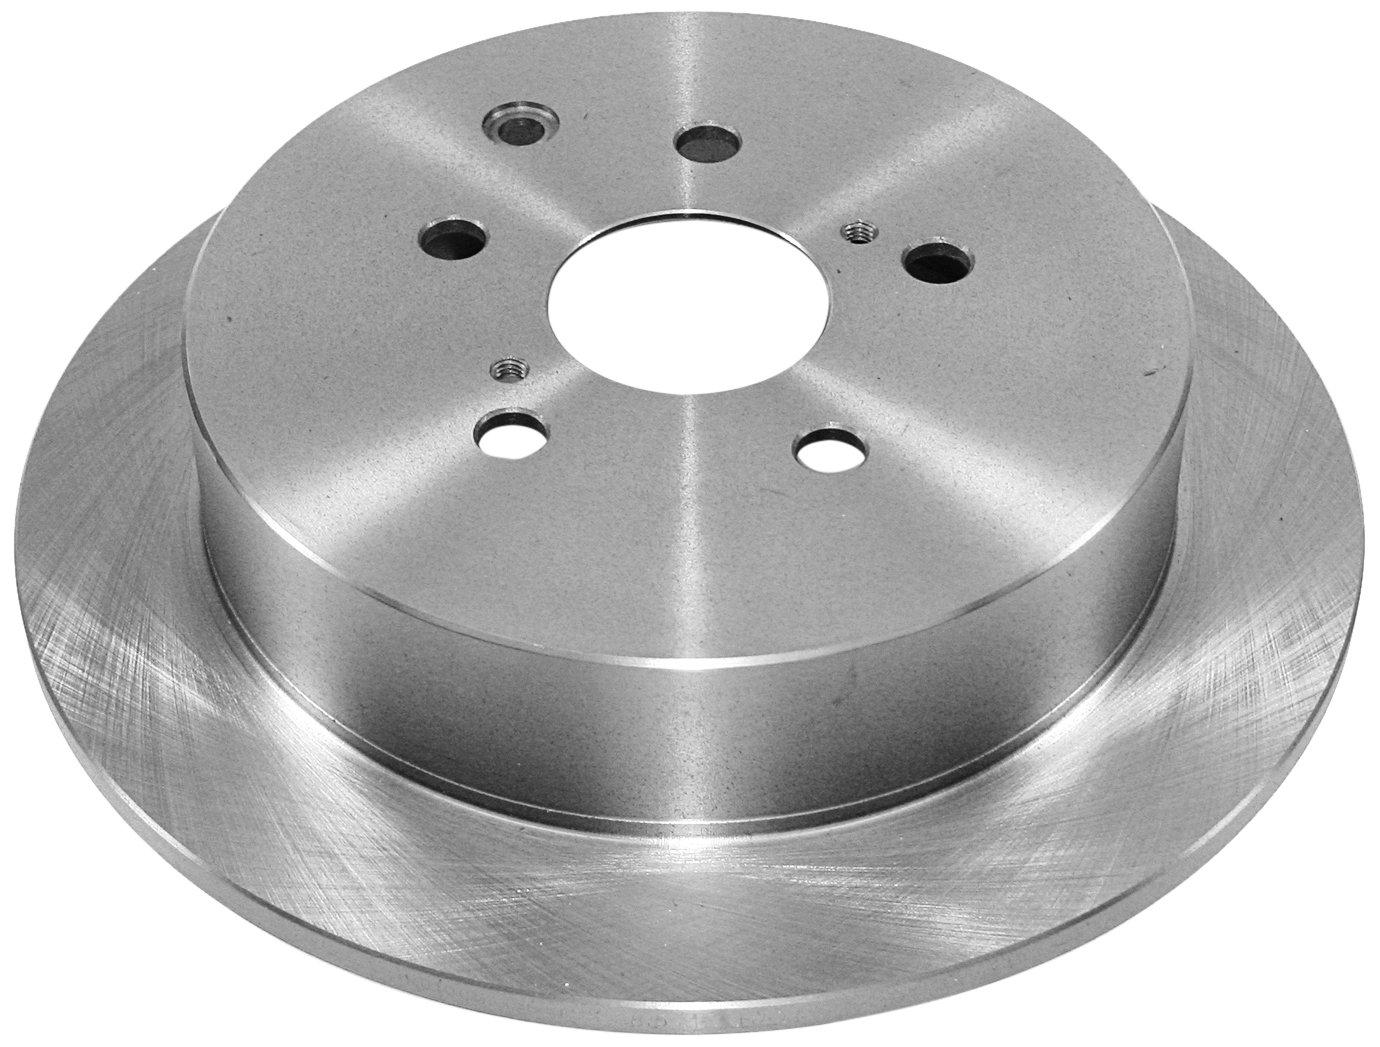 DuraGo BR901006 Rear Vented Disc Brake Rotor